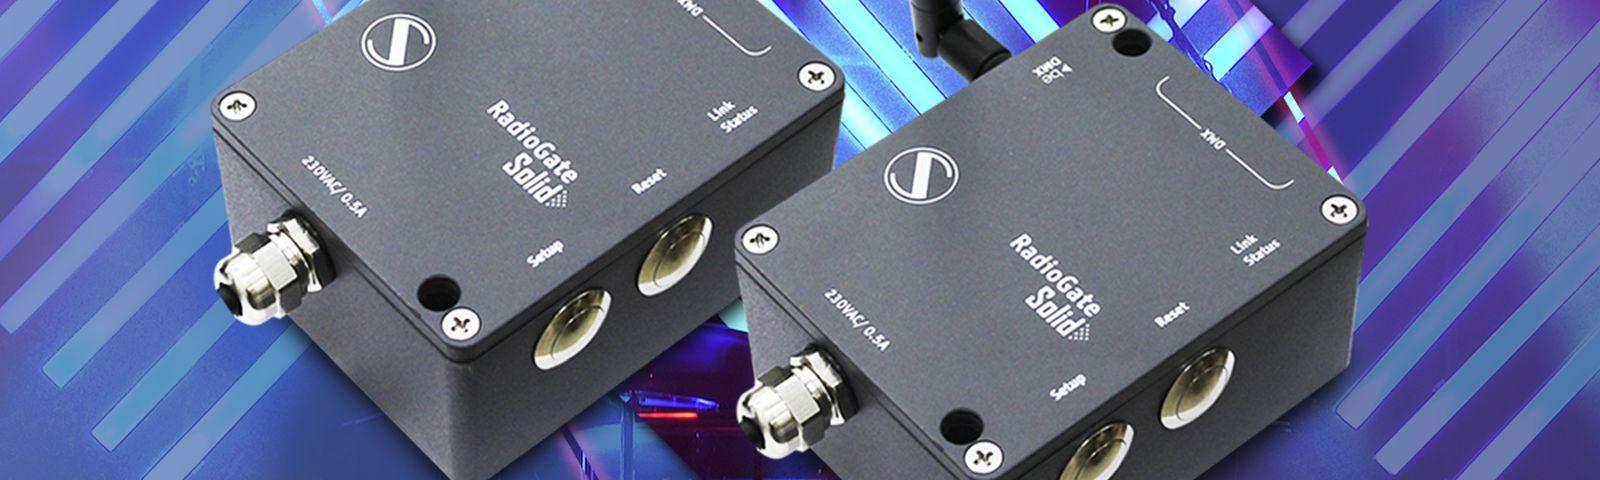 New generation of RadioGates, wireless DMX transceivers